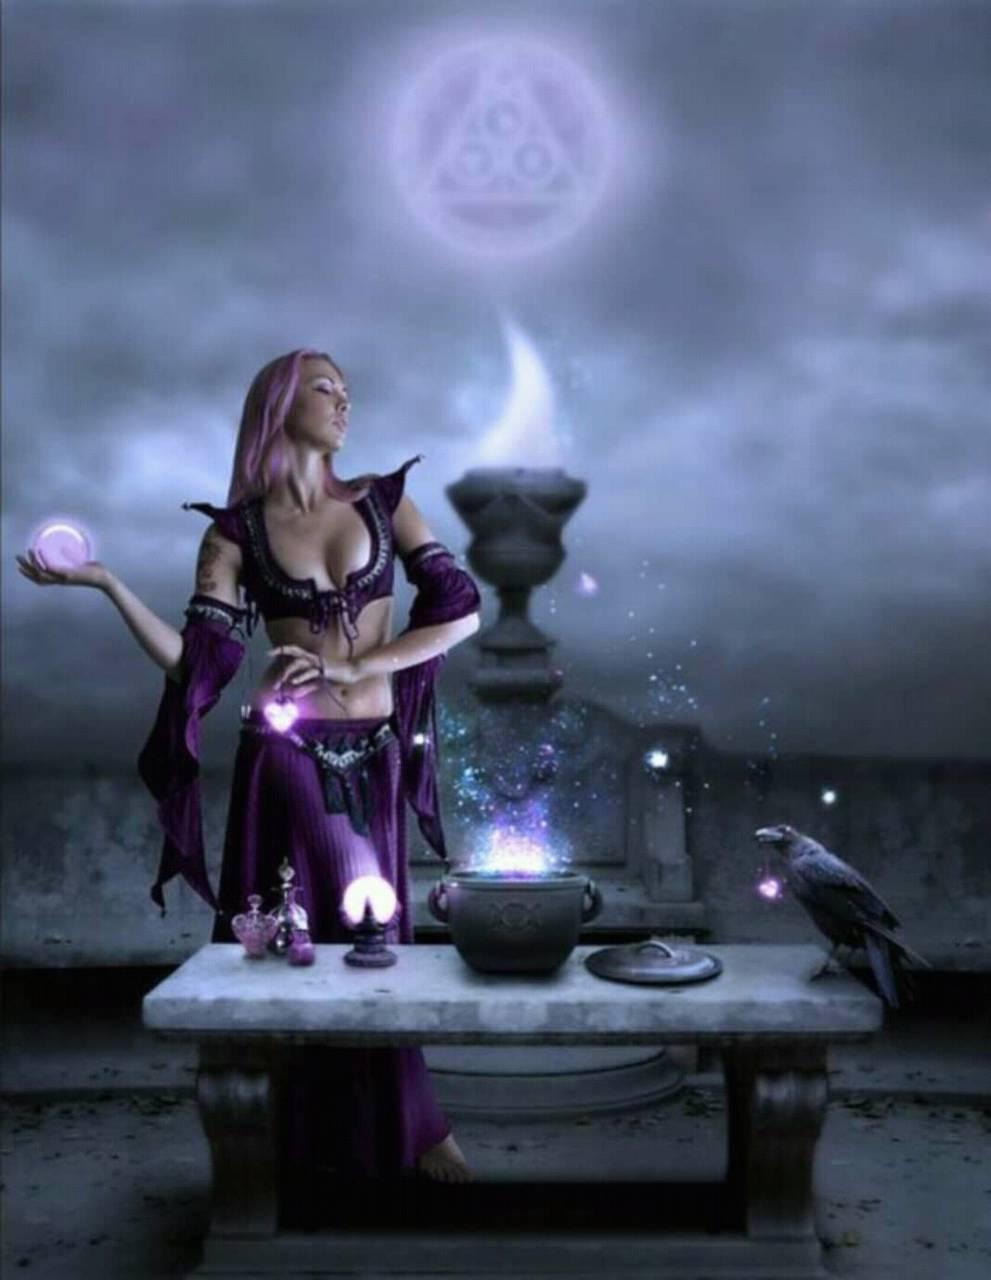 Magic is all around